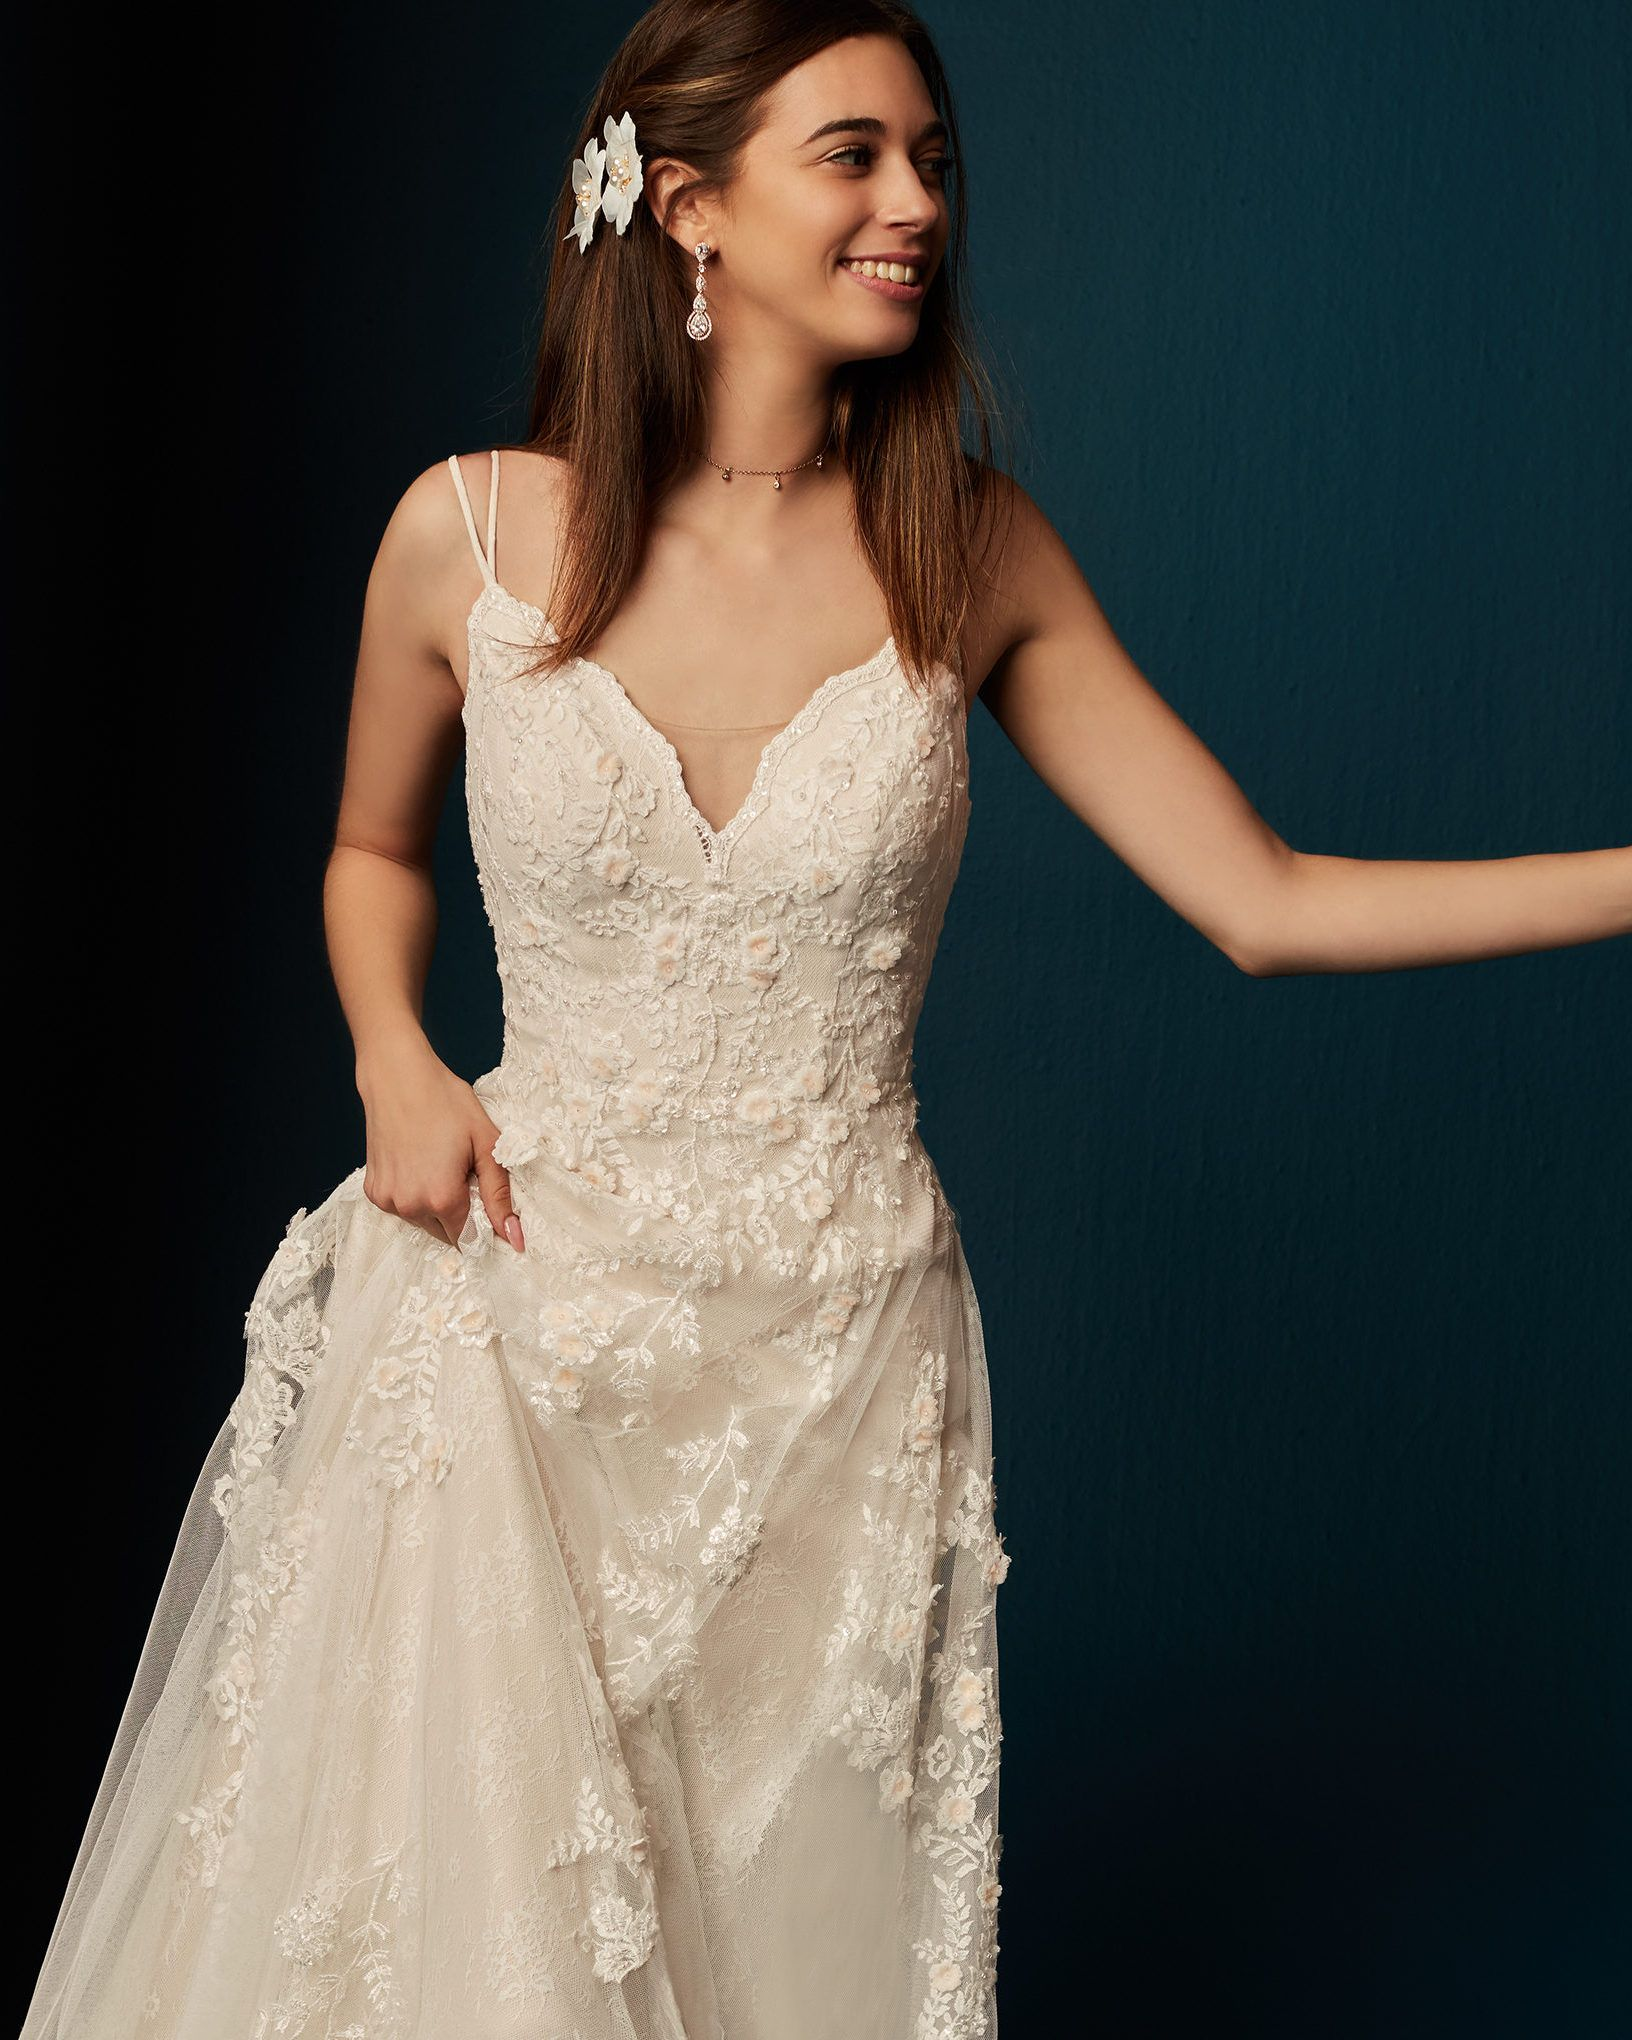 Rewear Your Wedding Accessories In 2020 Wedding Dress Accessories Wedding Dresses Dress Accessories